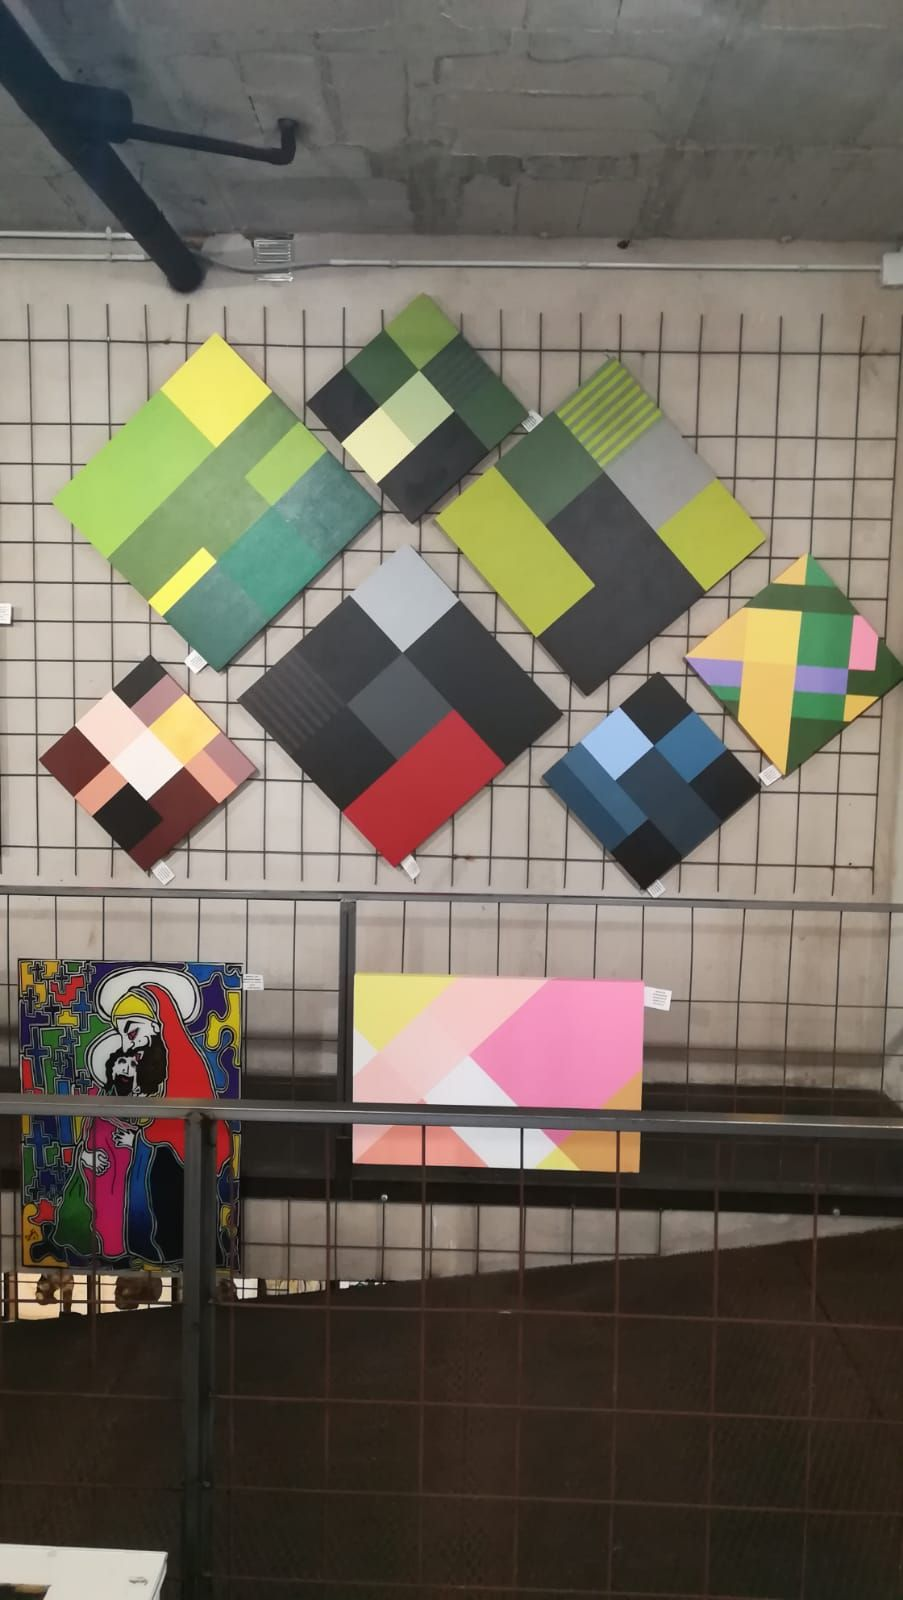 Exposición de arte en Sitges, Barcelona